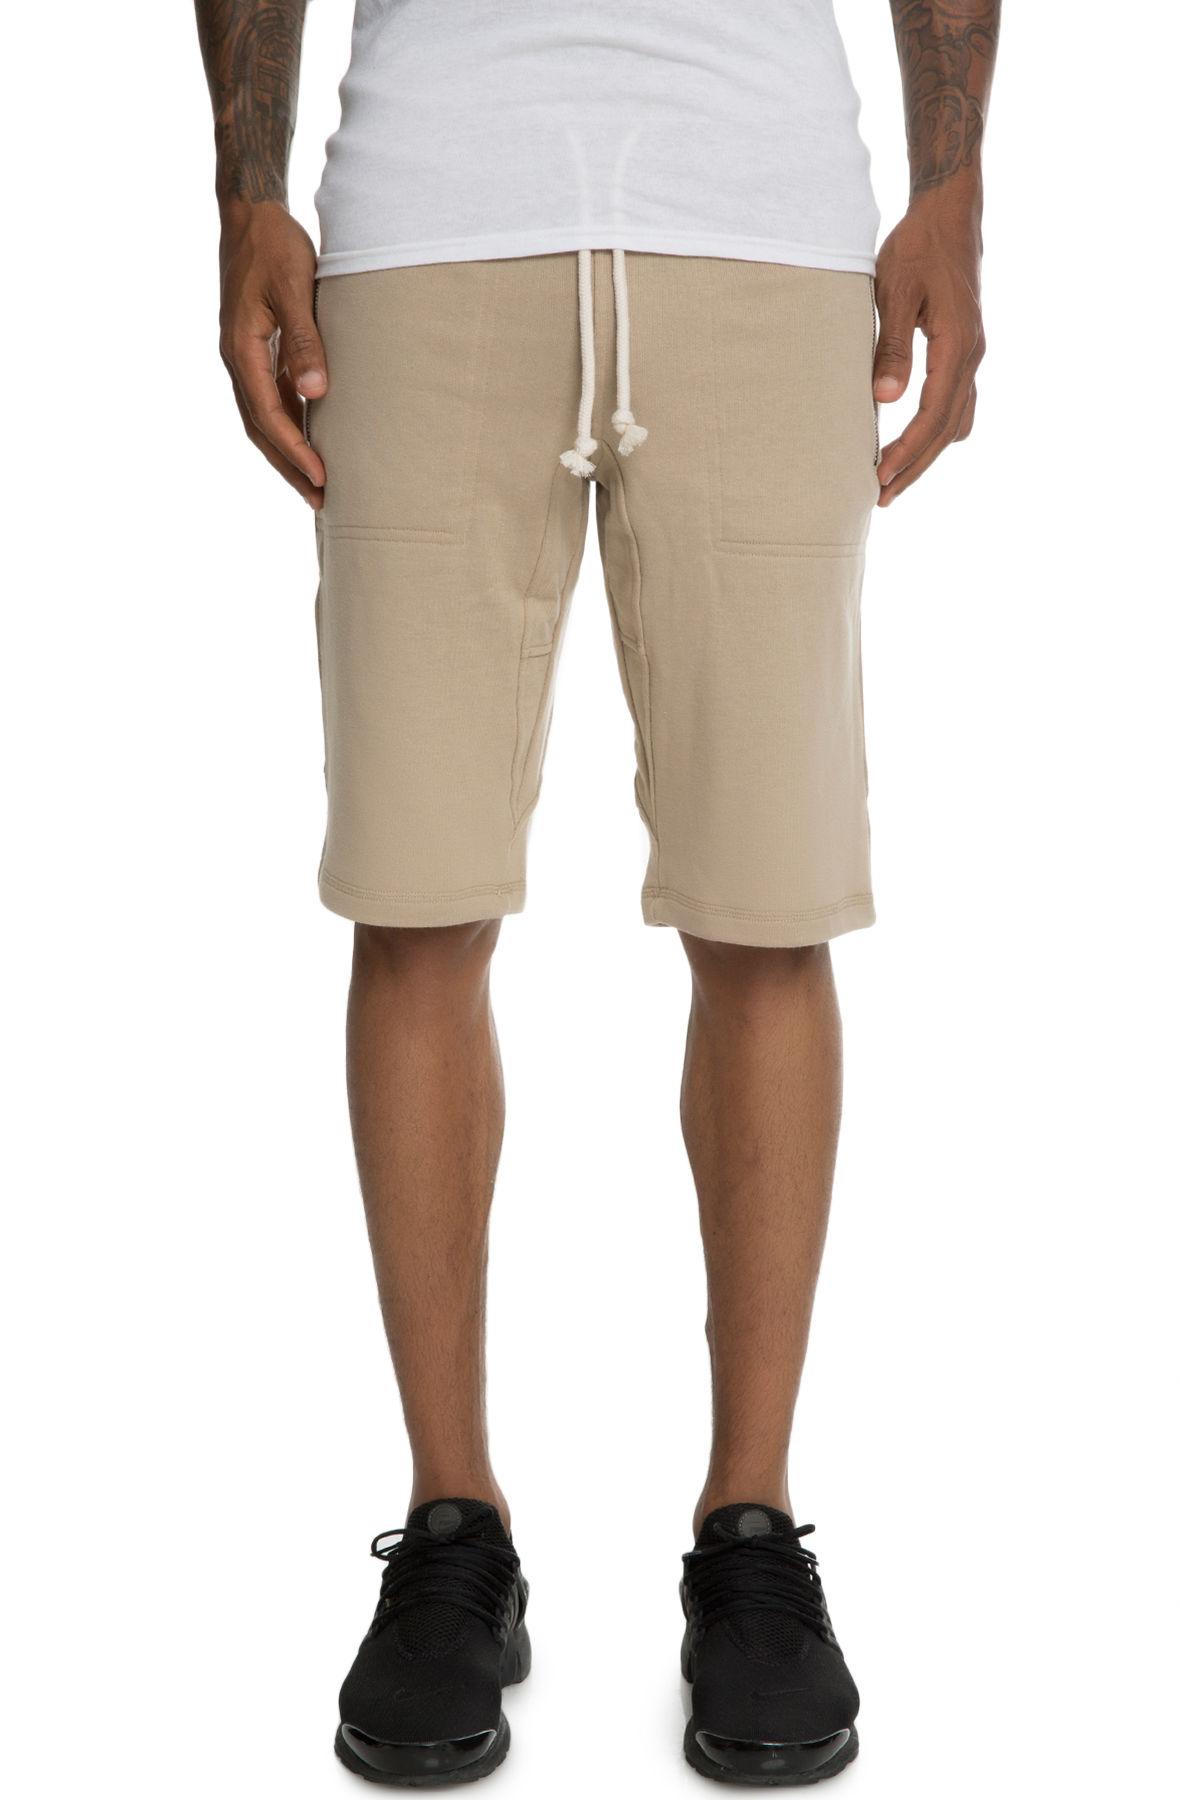 Image of The Laurencio Fleece shorts in Sand